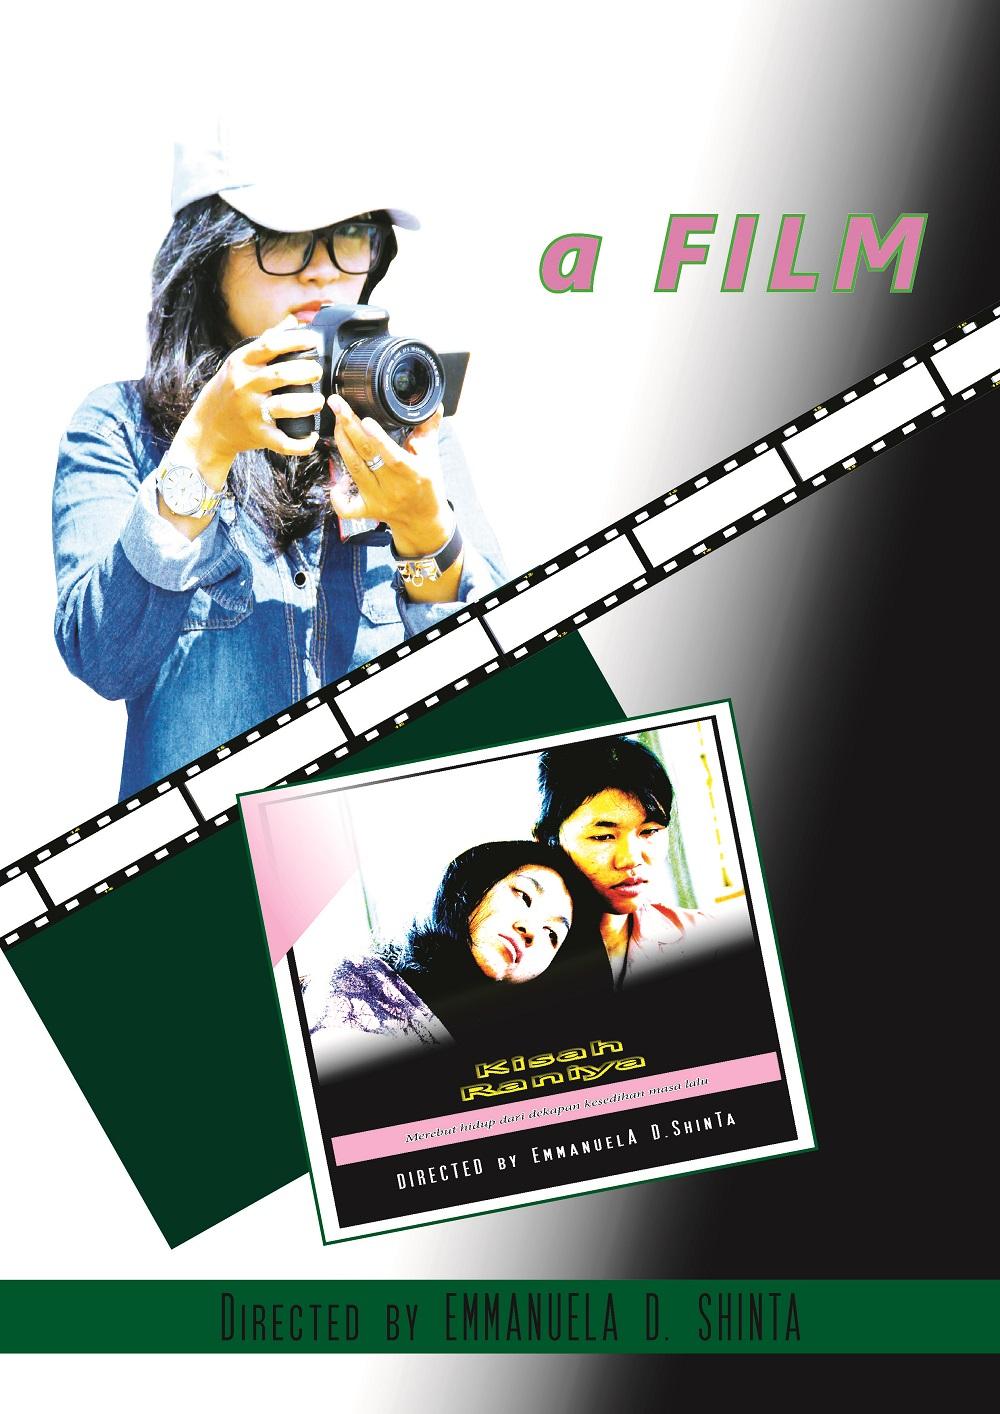 isff-2015-a-film-trailer-d6afe6.jpg